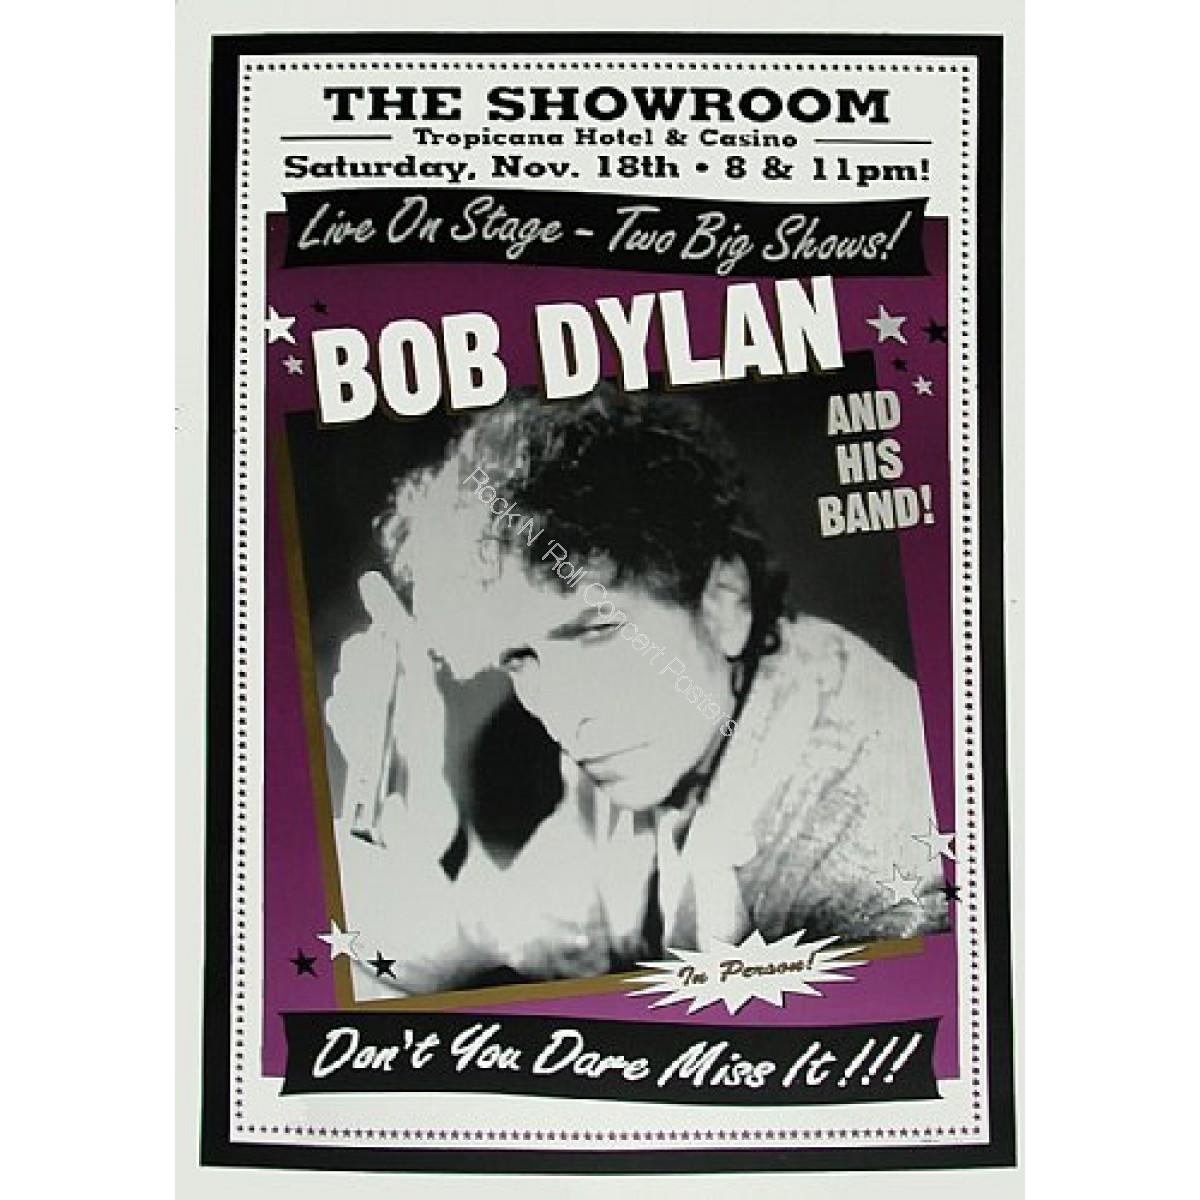 Bob Dylan & His Band @ The Tropicana Hotel